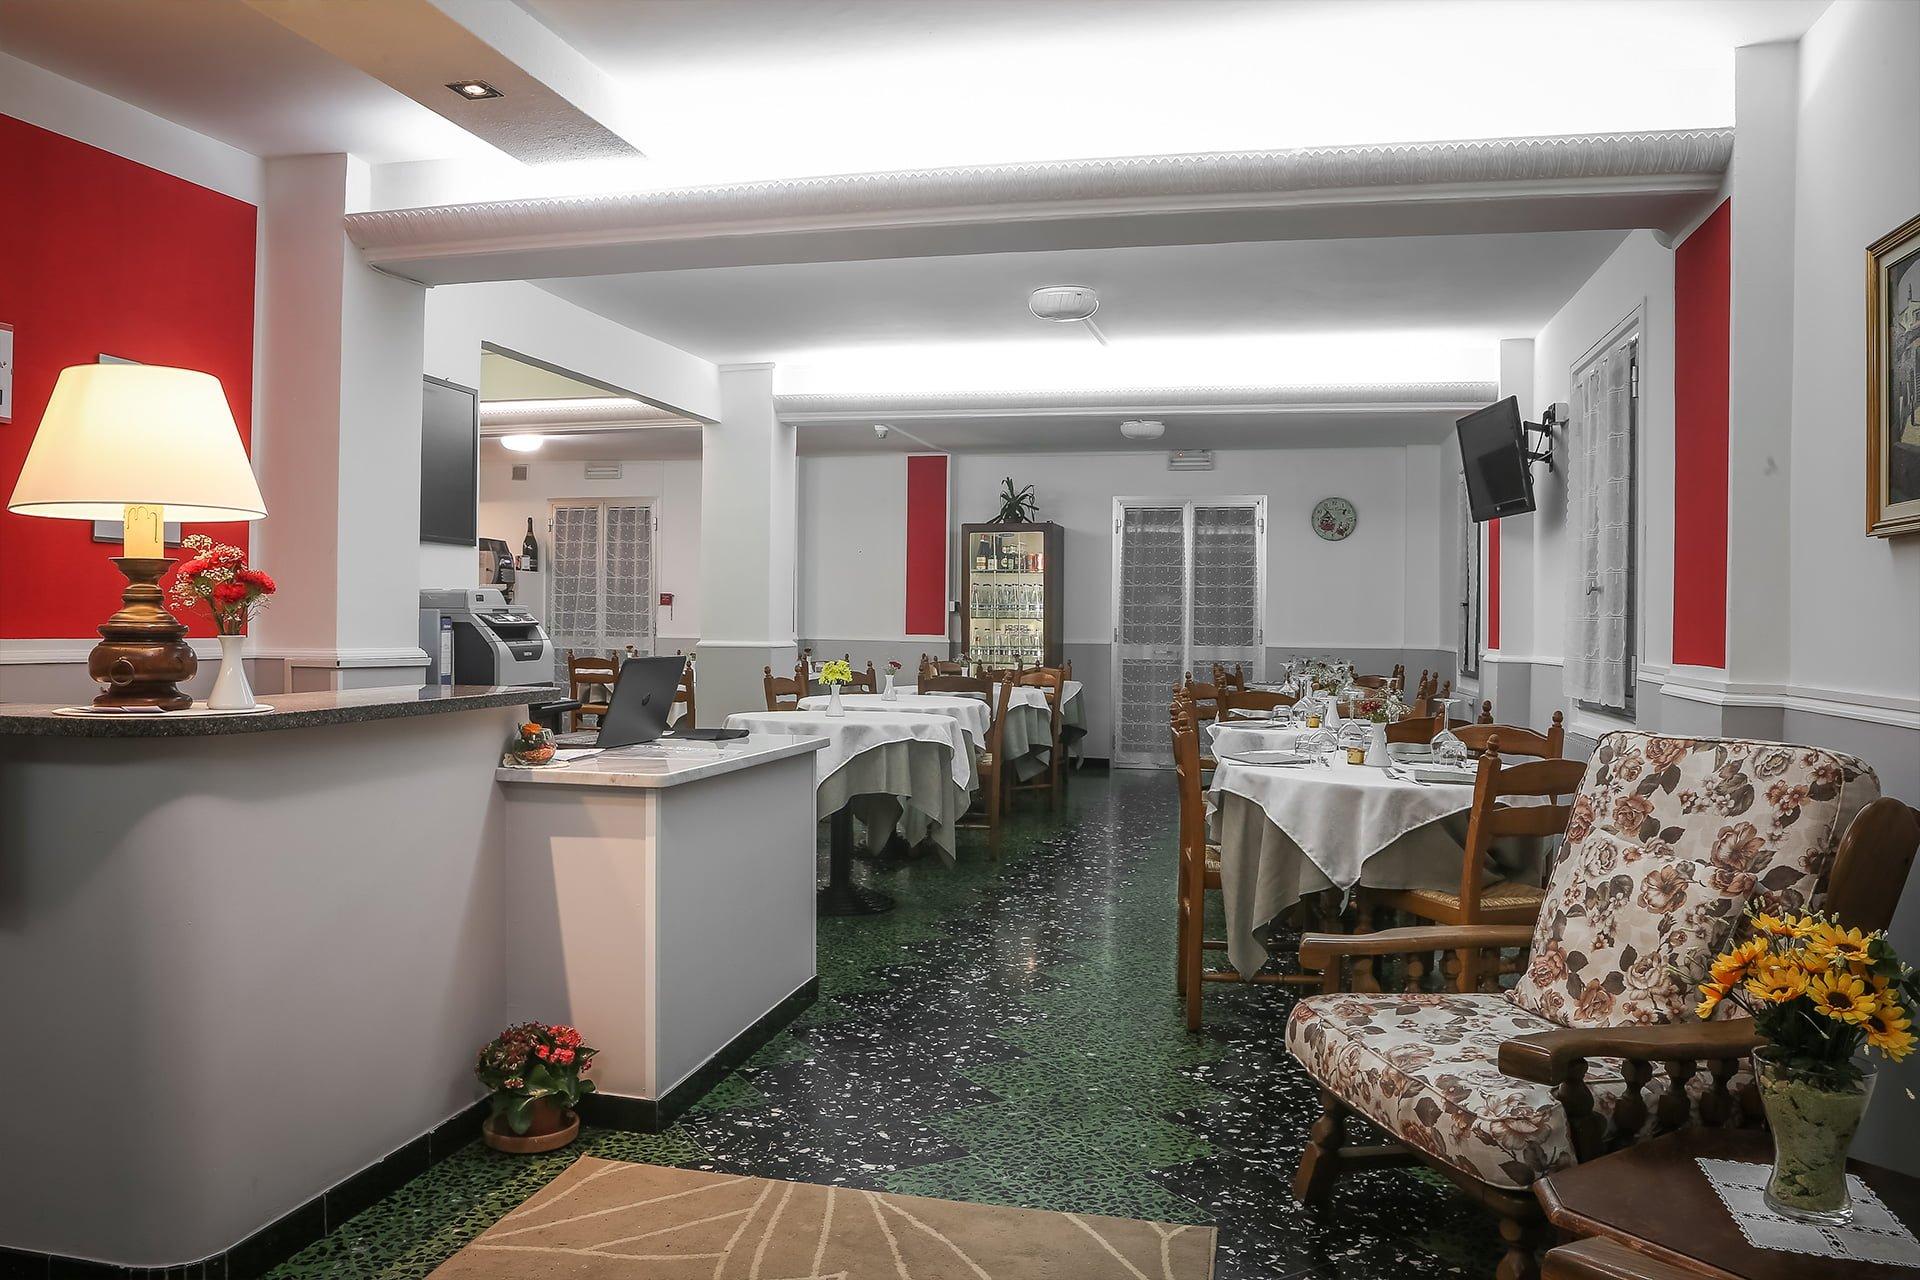 Albergo-Margherita-Varazze-Reception